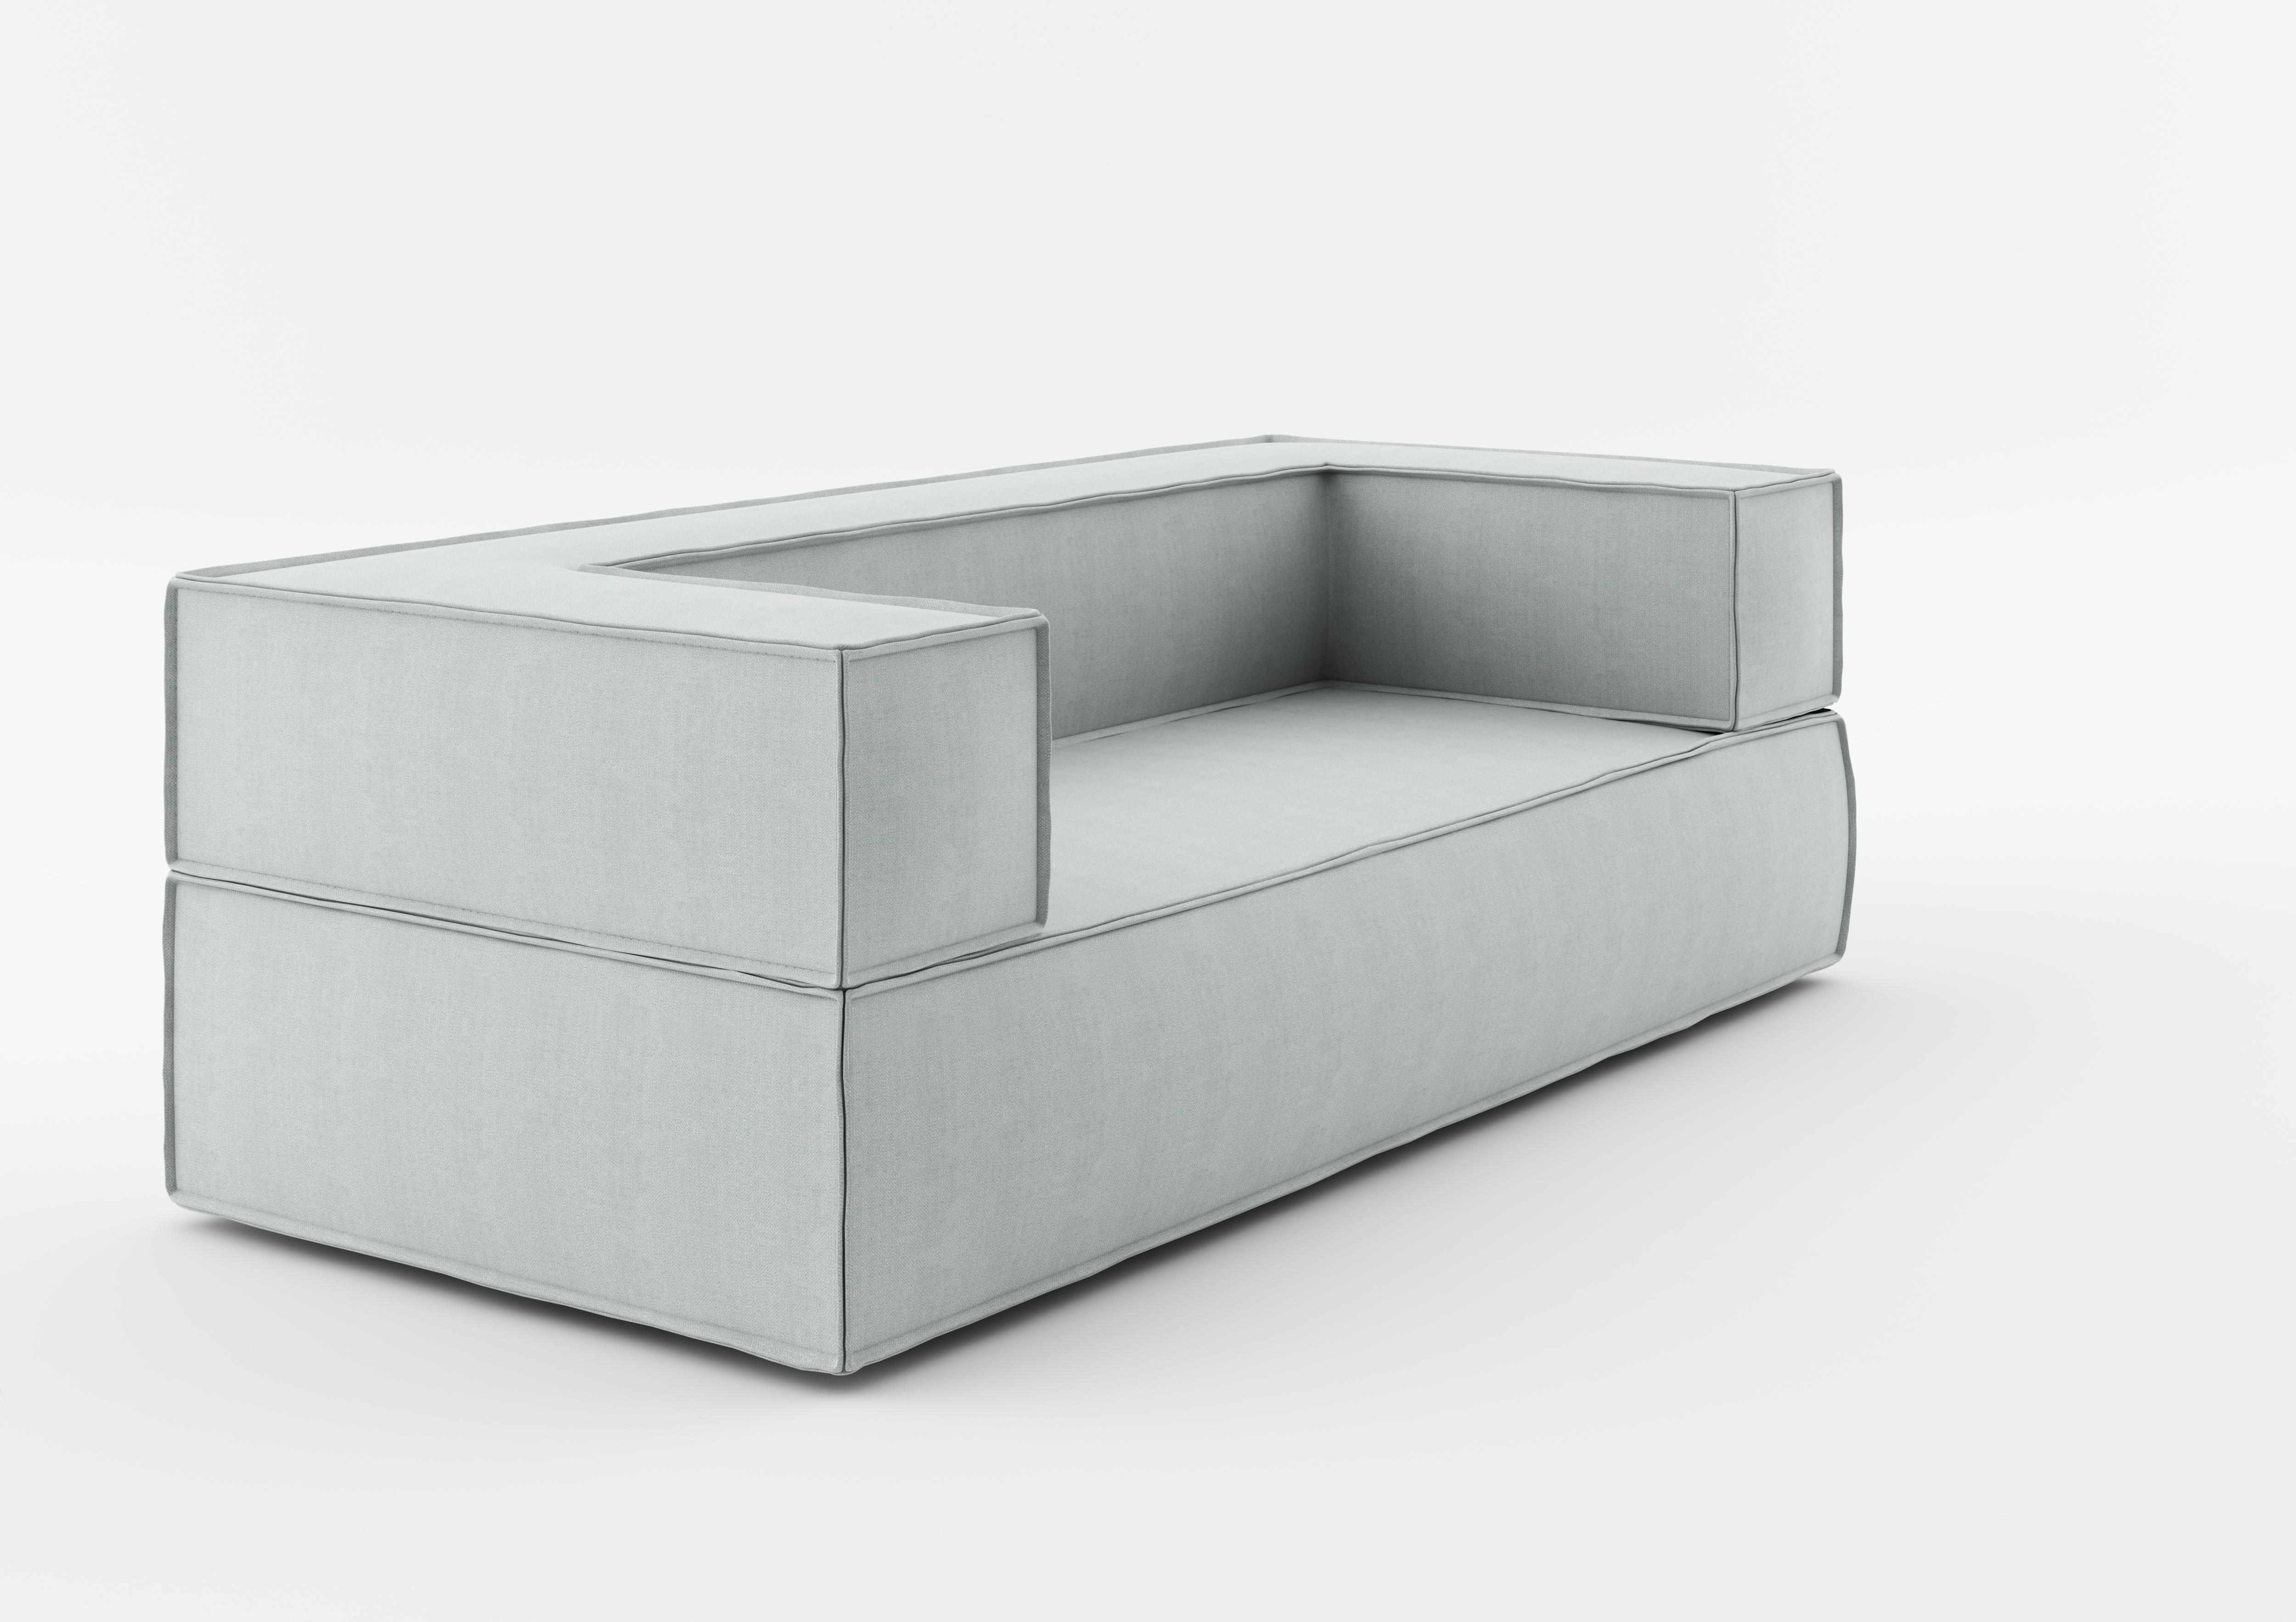 Canapea NOi 200 Grey